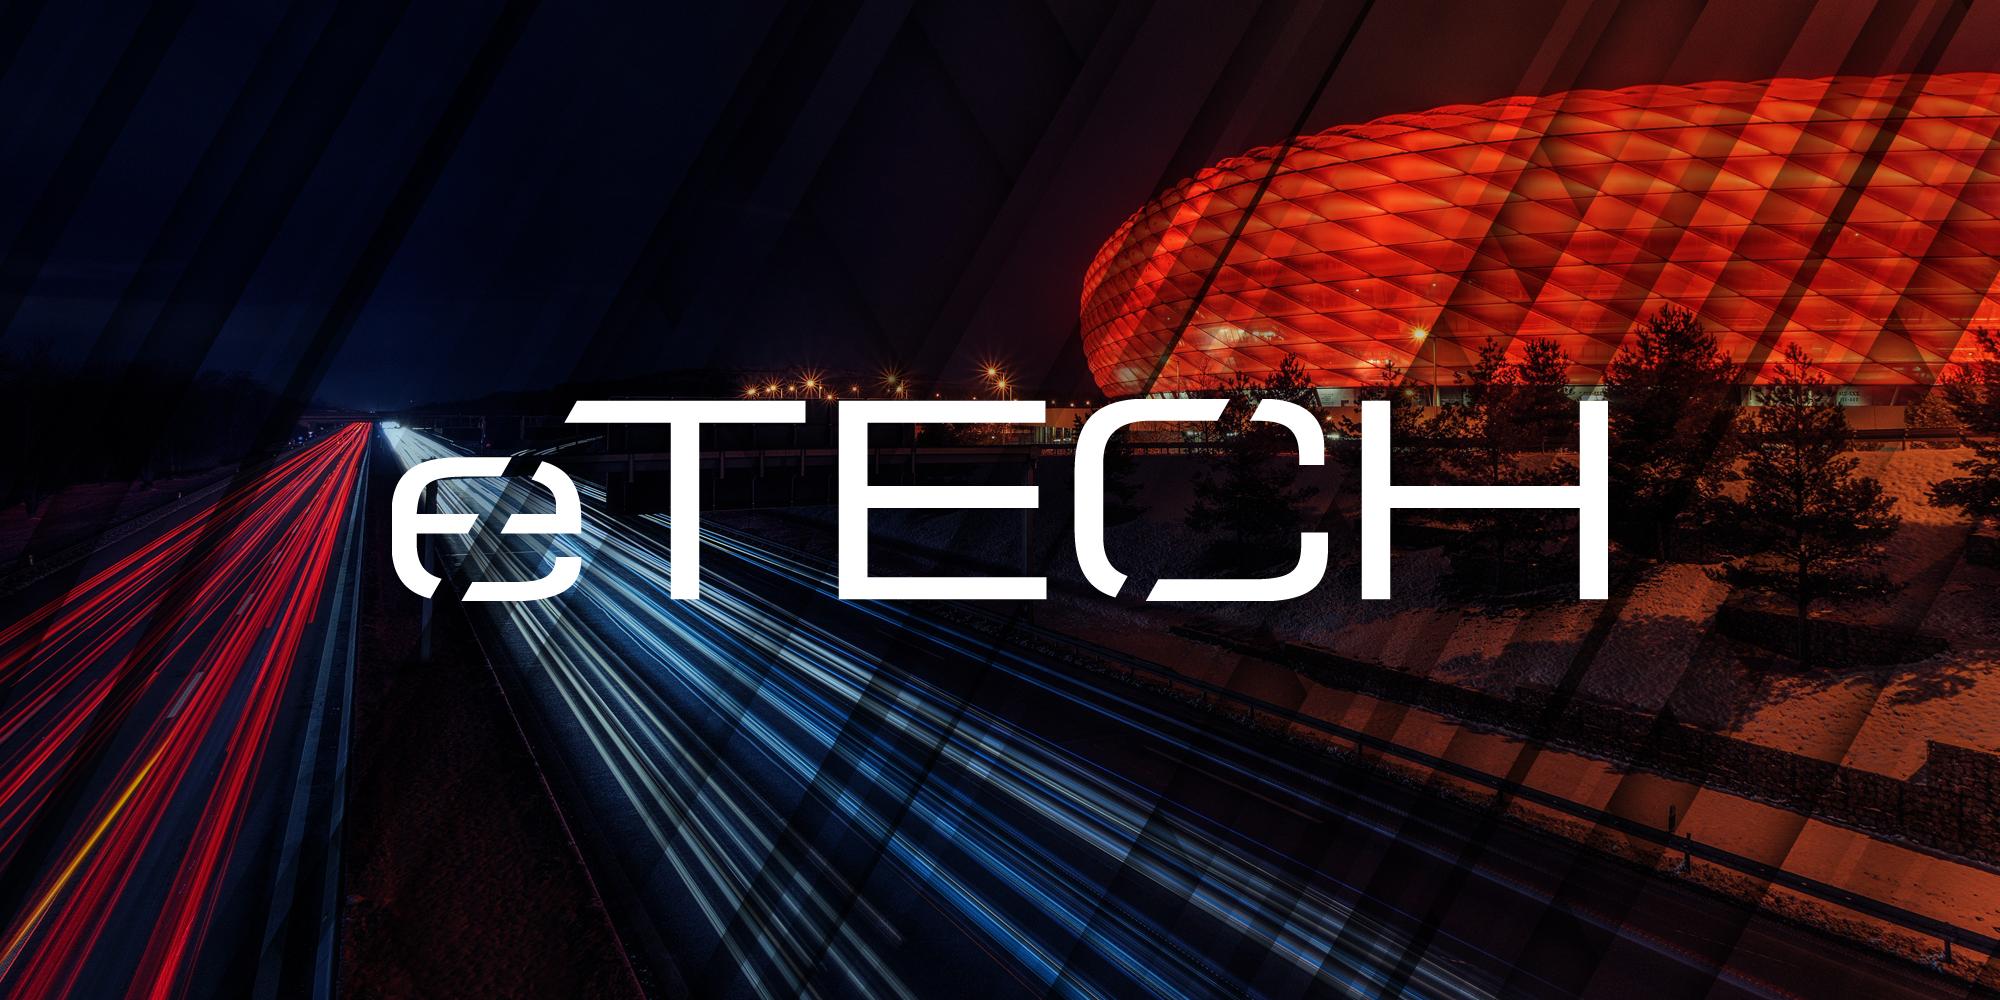 ETECH-logo-03.jpg